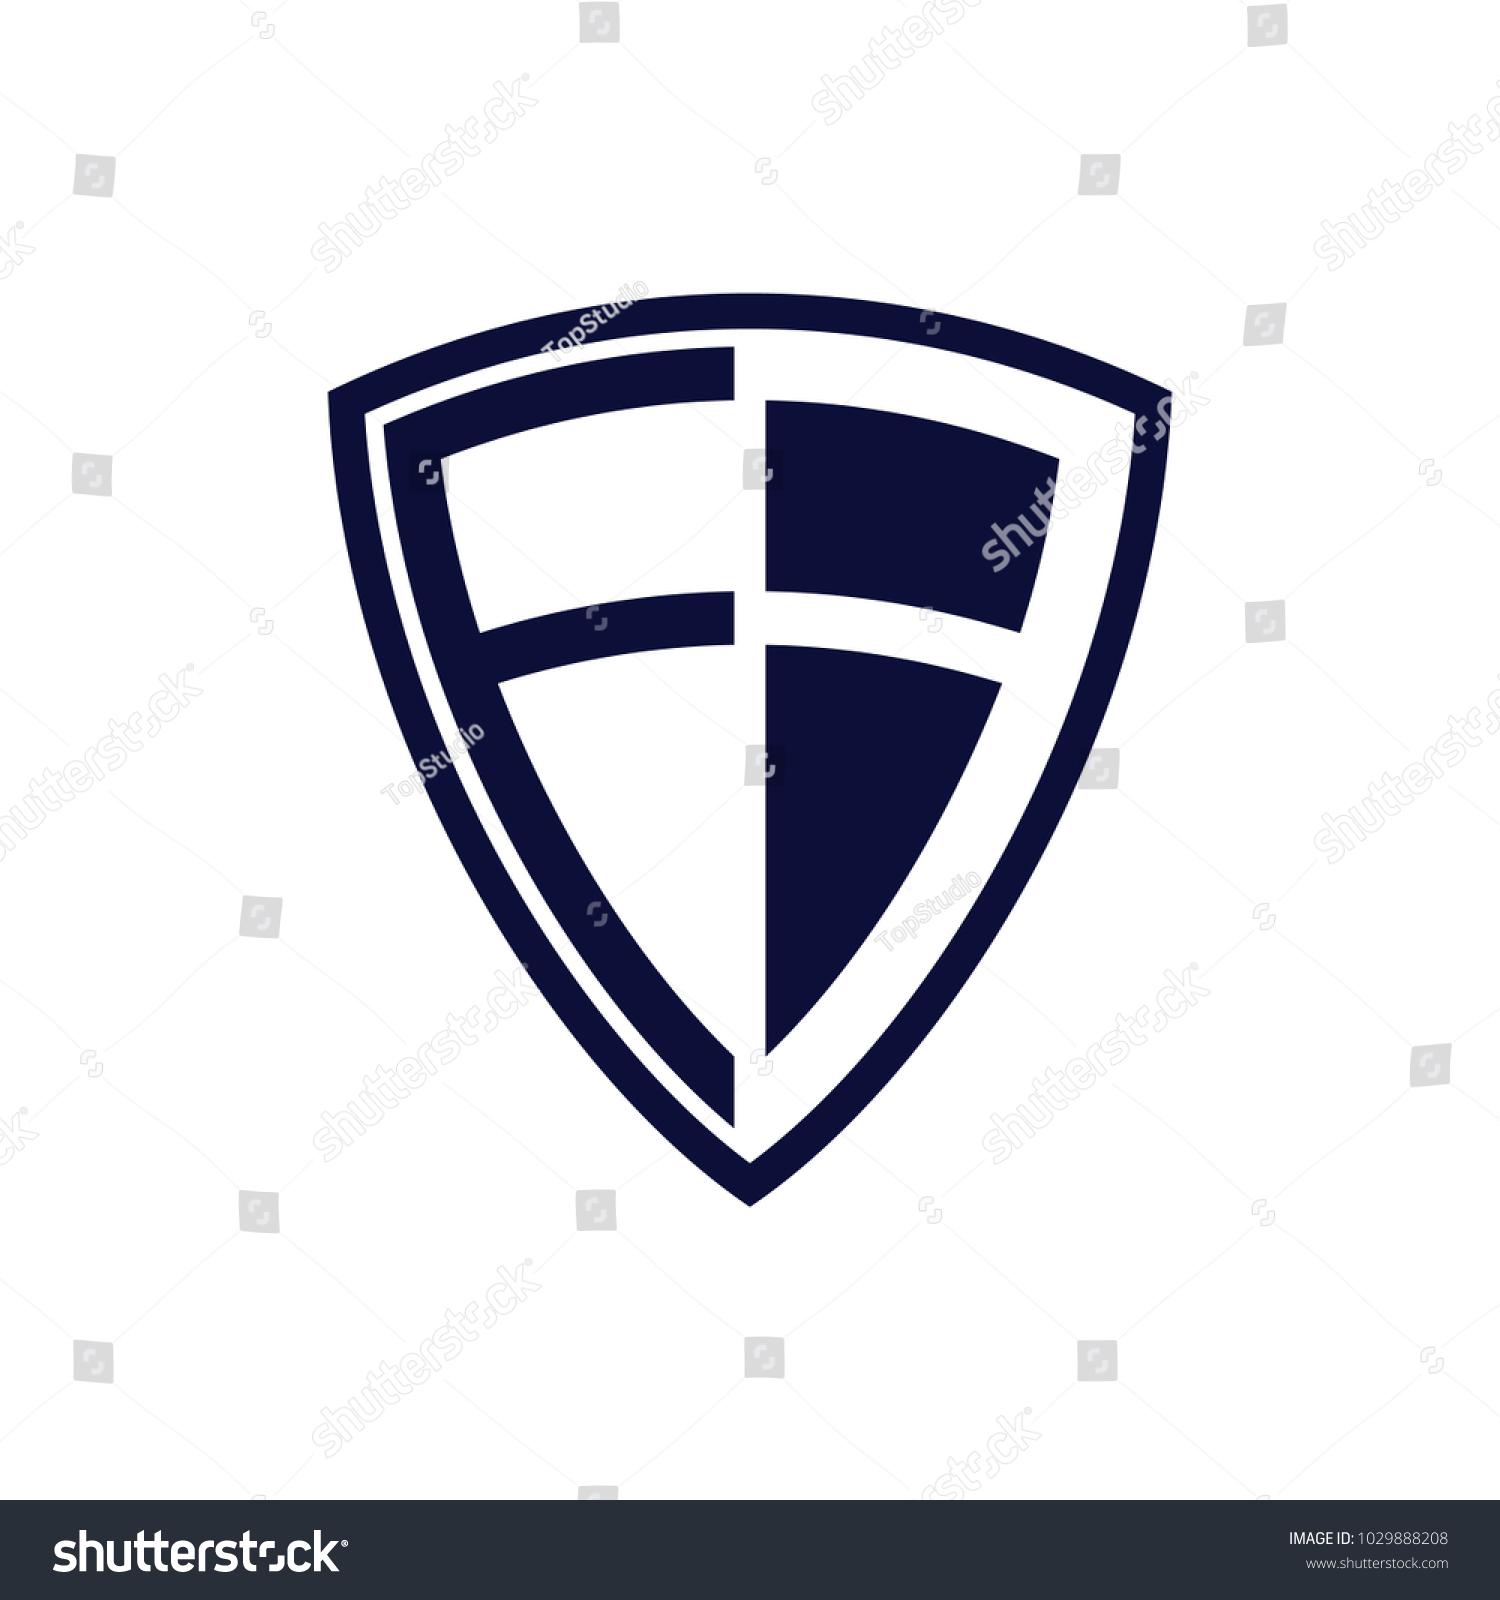 F B Logo Design Template Shield Stock Vector 1029888208 - Shutterstock